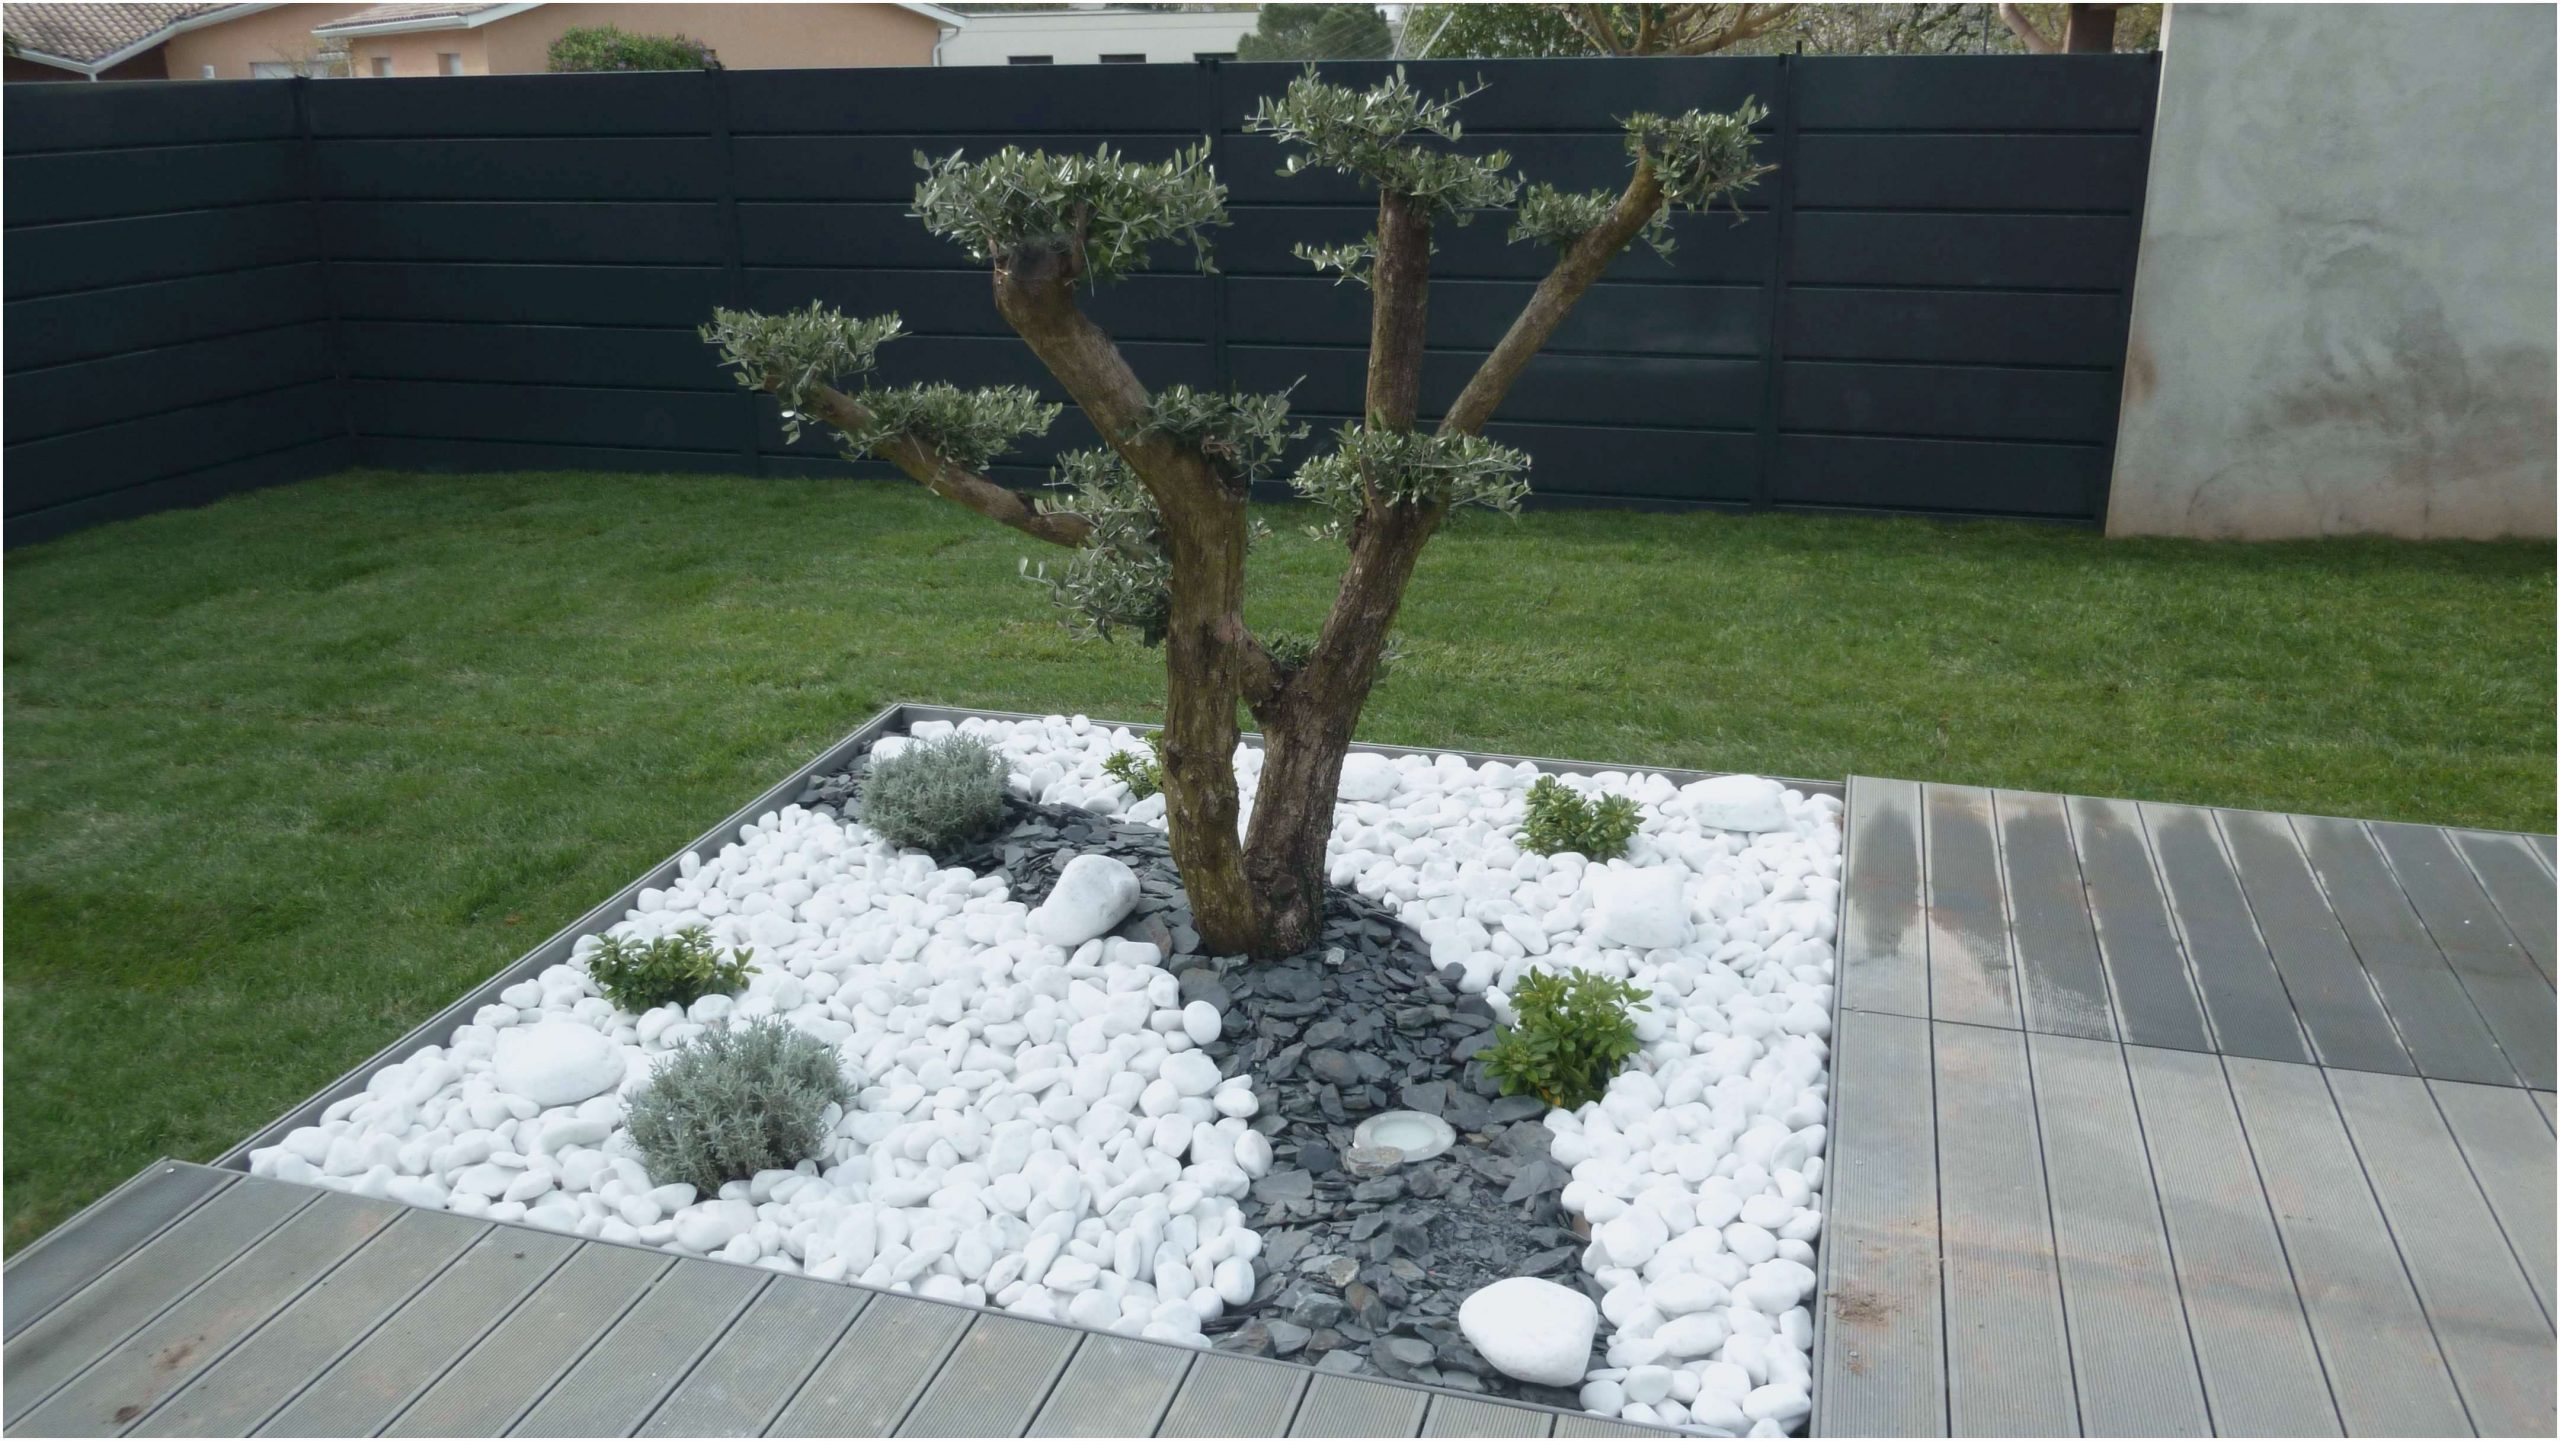 Idee Deco Jardin Avec Gravillon   Aménagement Jardin ... destiné Massif Decoratif Exterieur